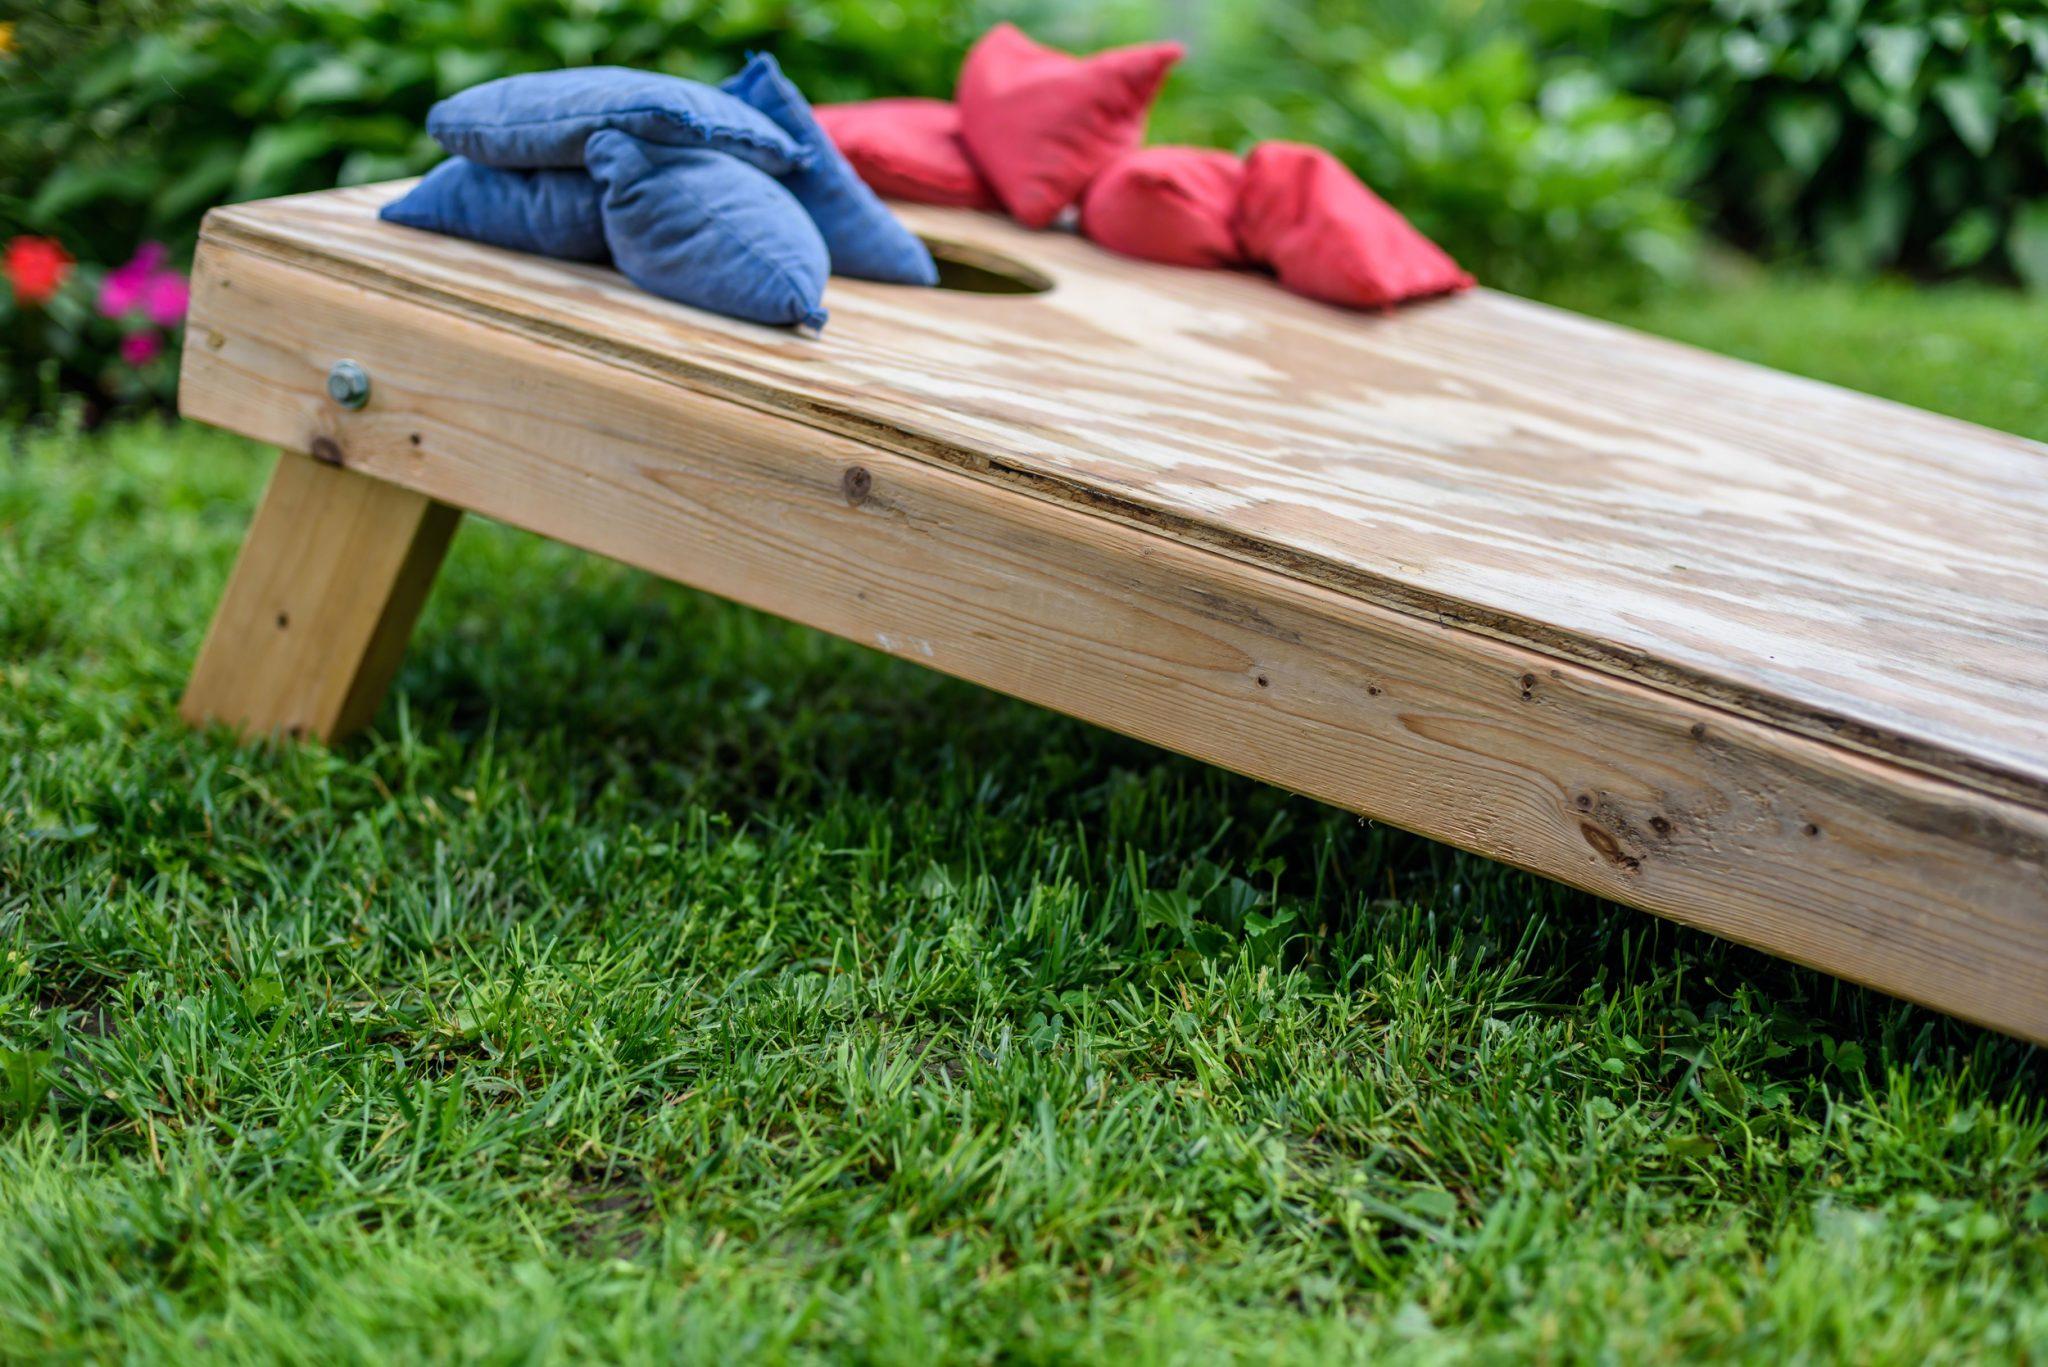 DIY Lawn Games for kids